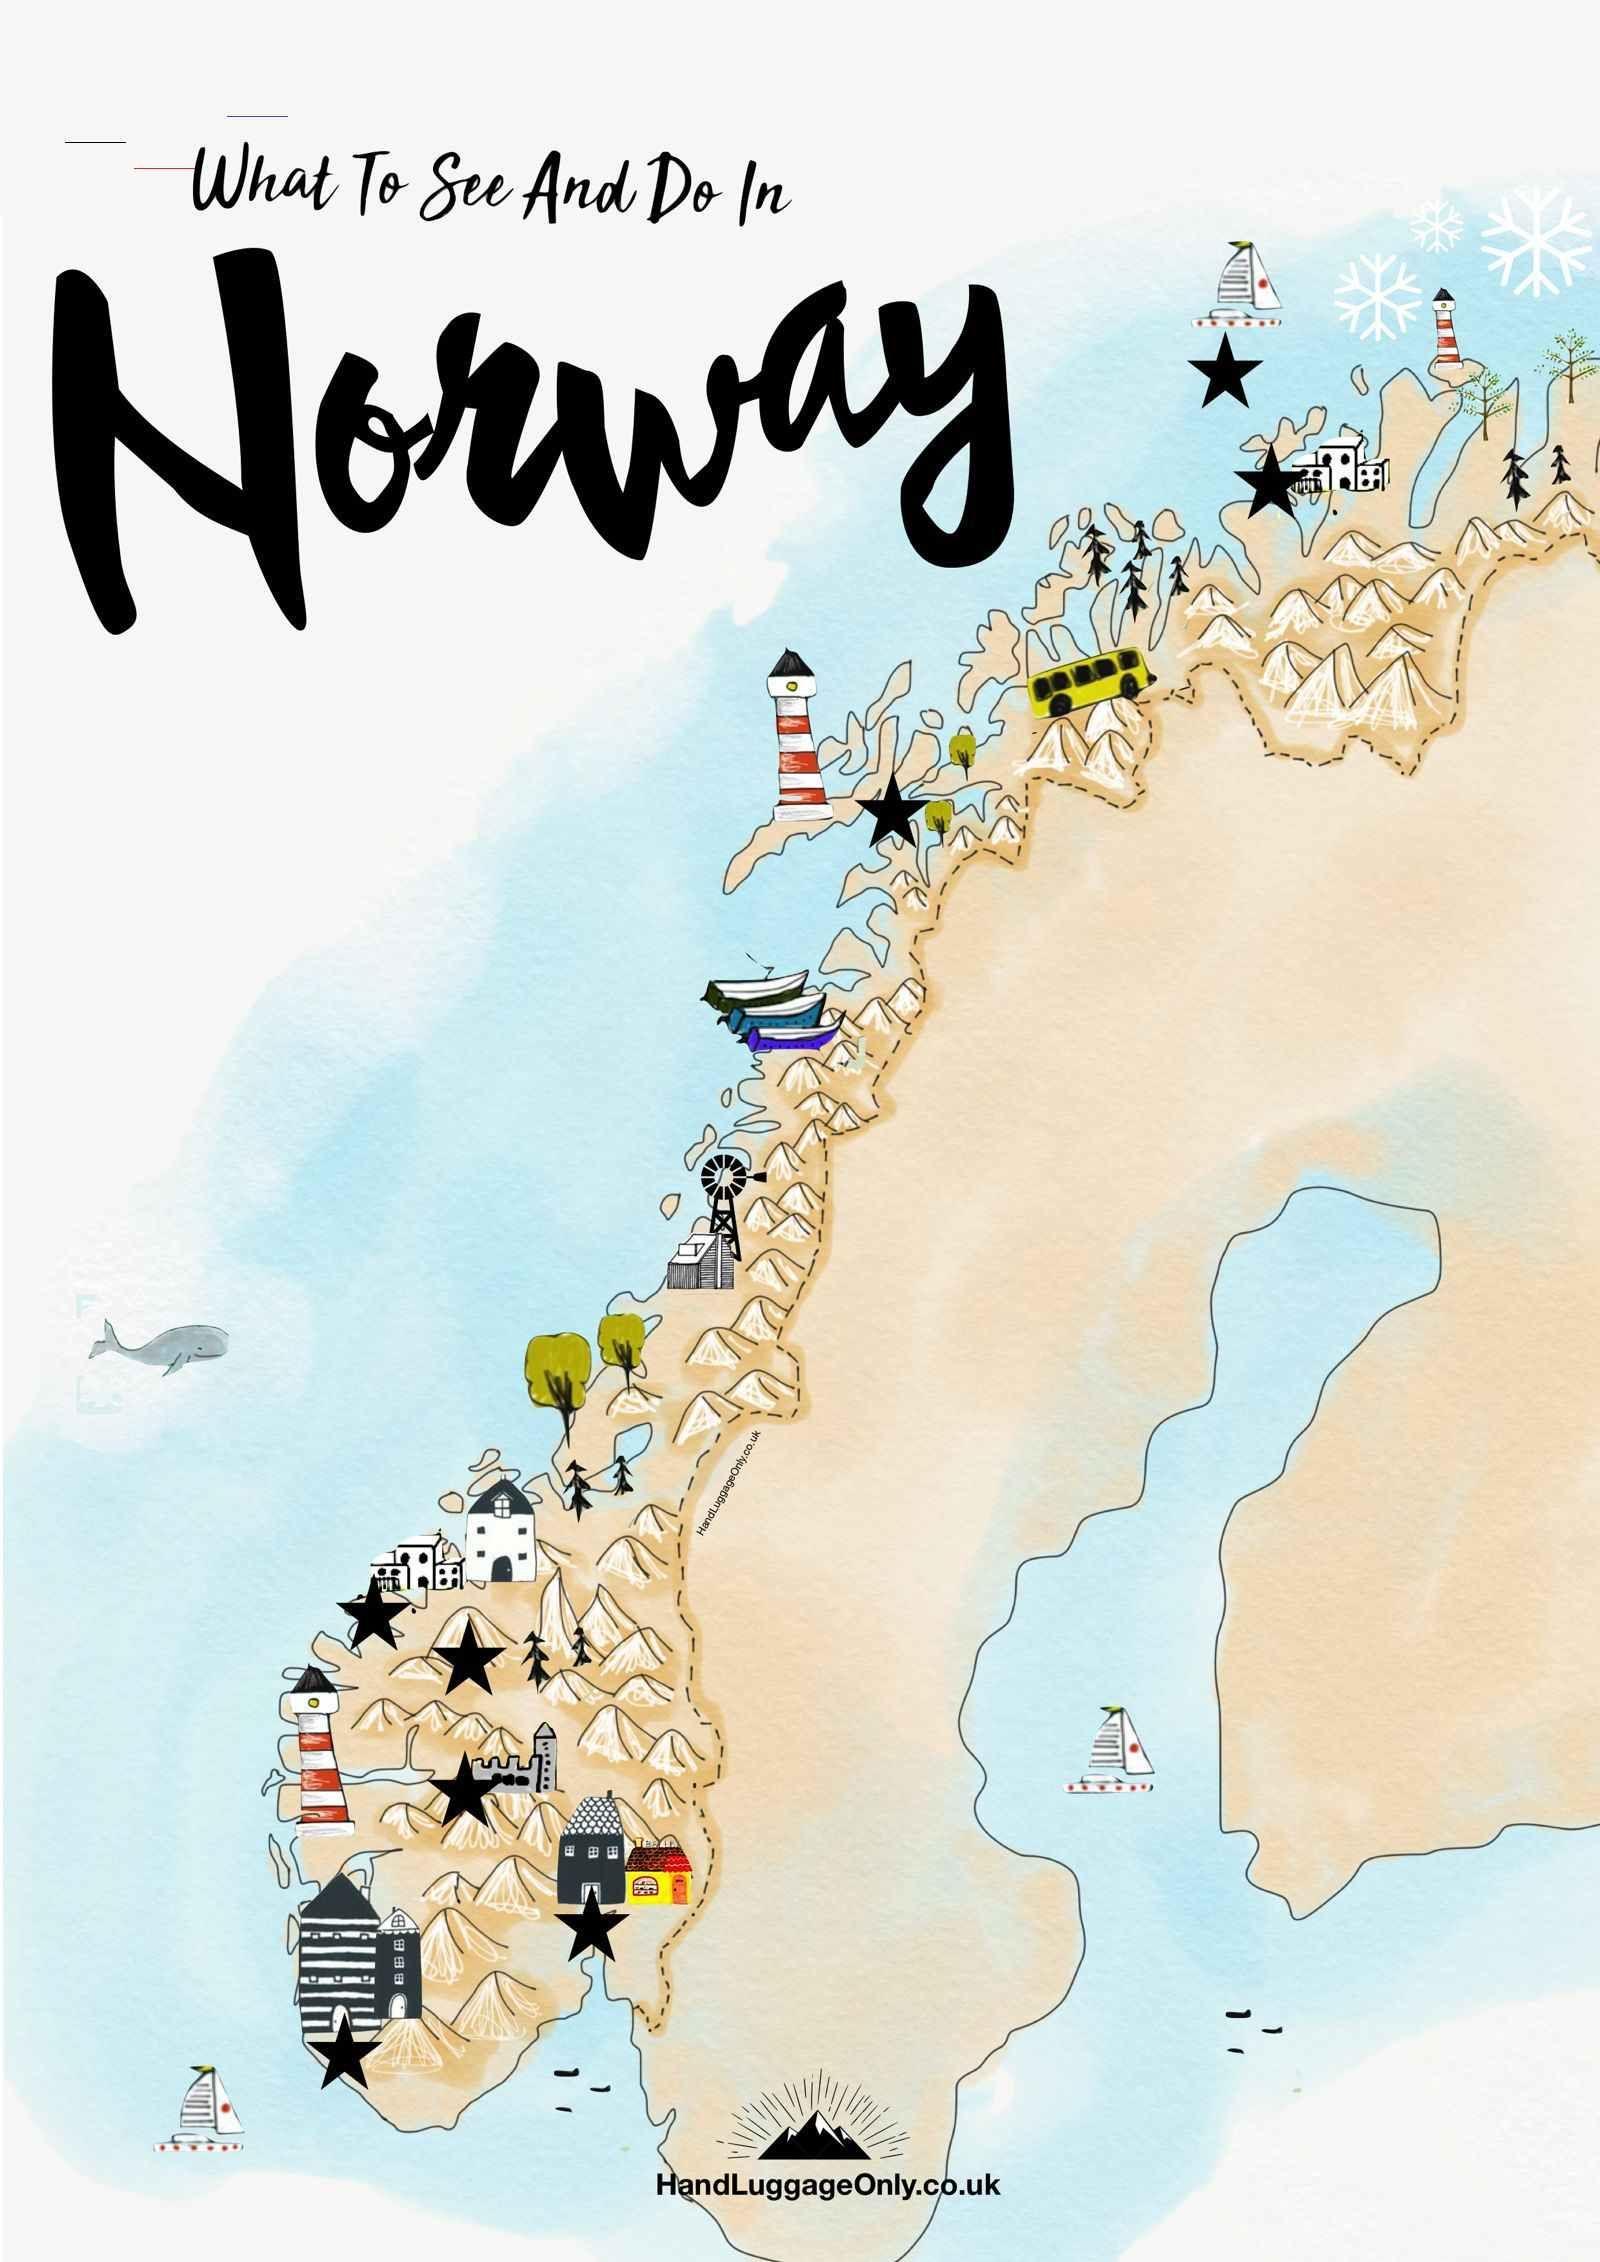 15 Best Places In Norway You Have To Visit Handluggage There Are So Many Best Places In Norway To Visit I Mean Yo In 2020 Noorwegen Reizen Noorwegen Scandinavie